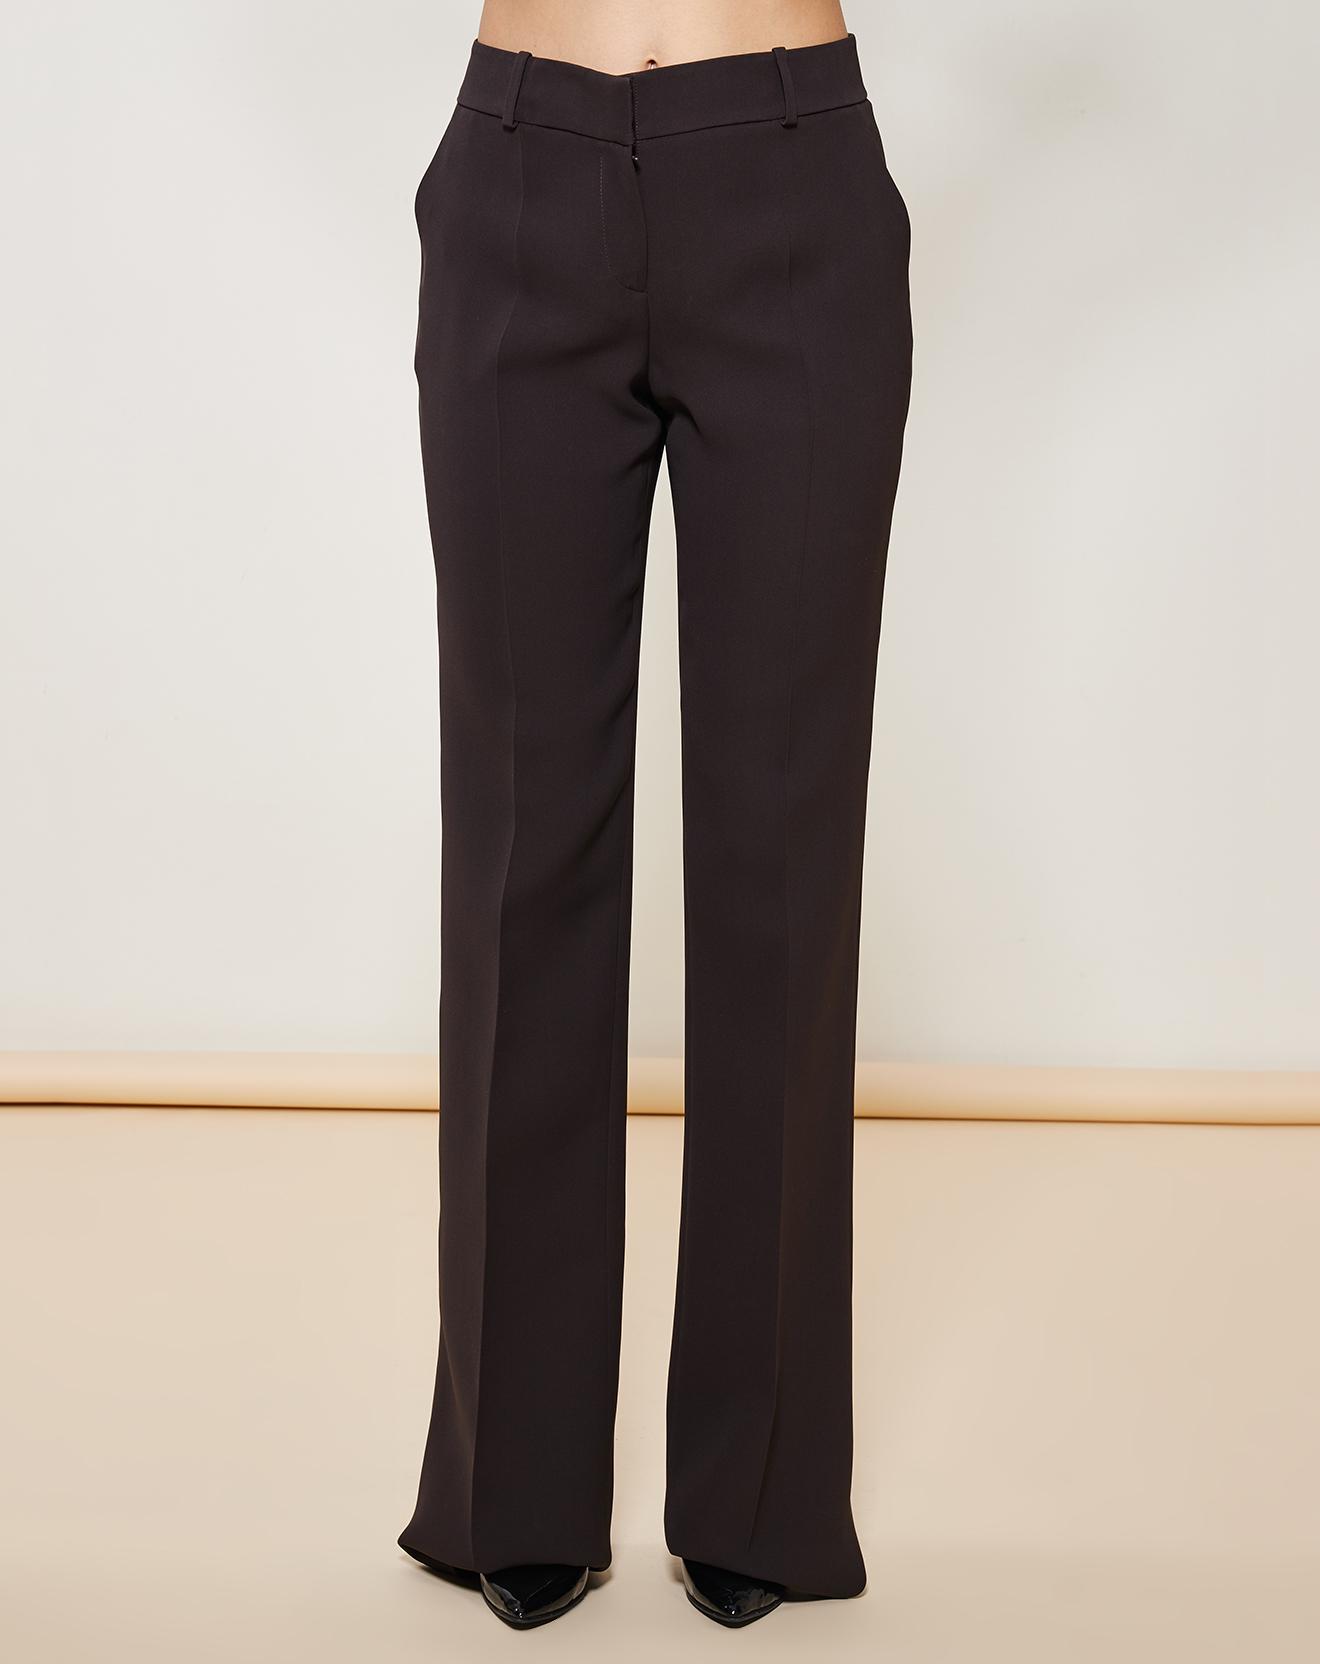 Pantalon flare 100% Soie uni marron